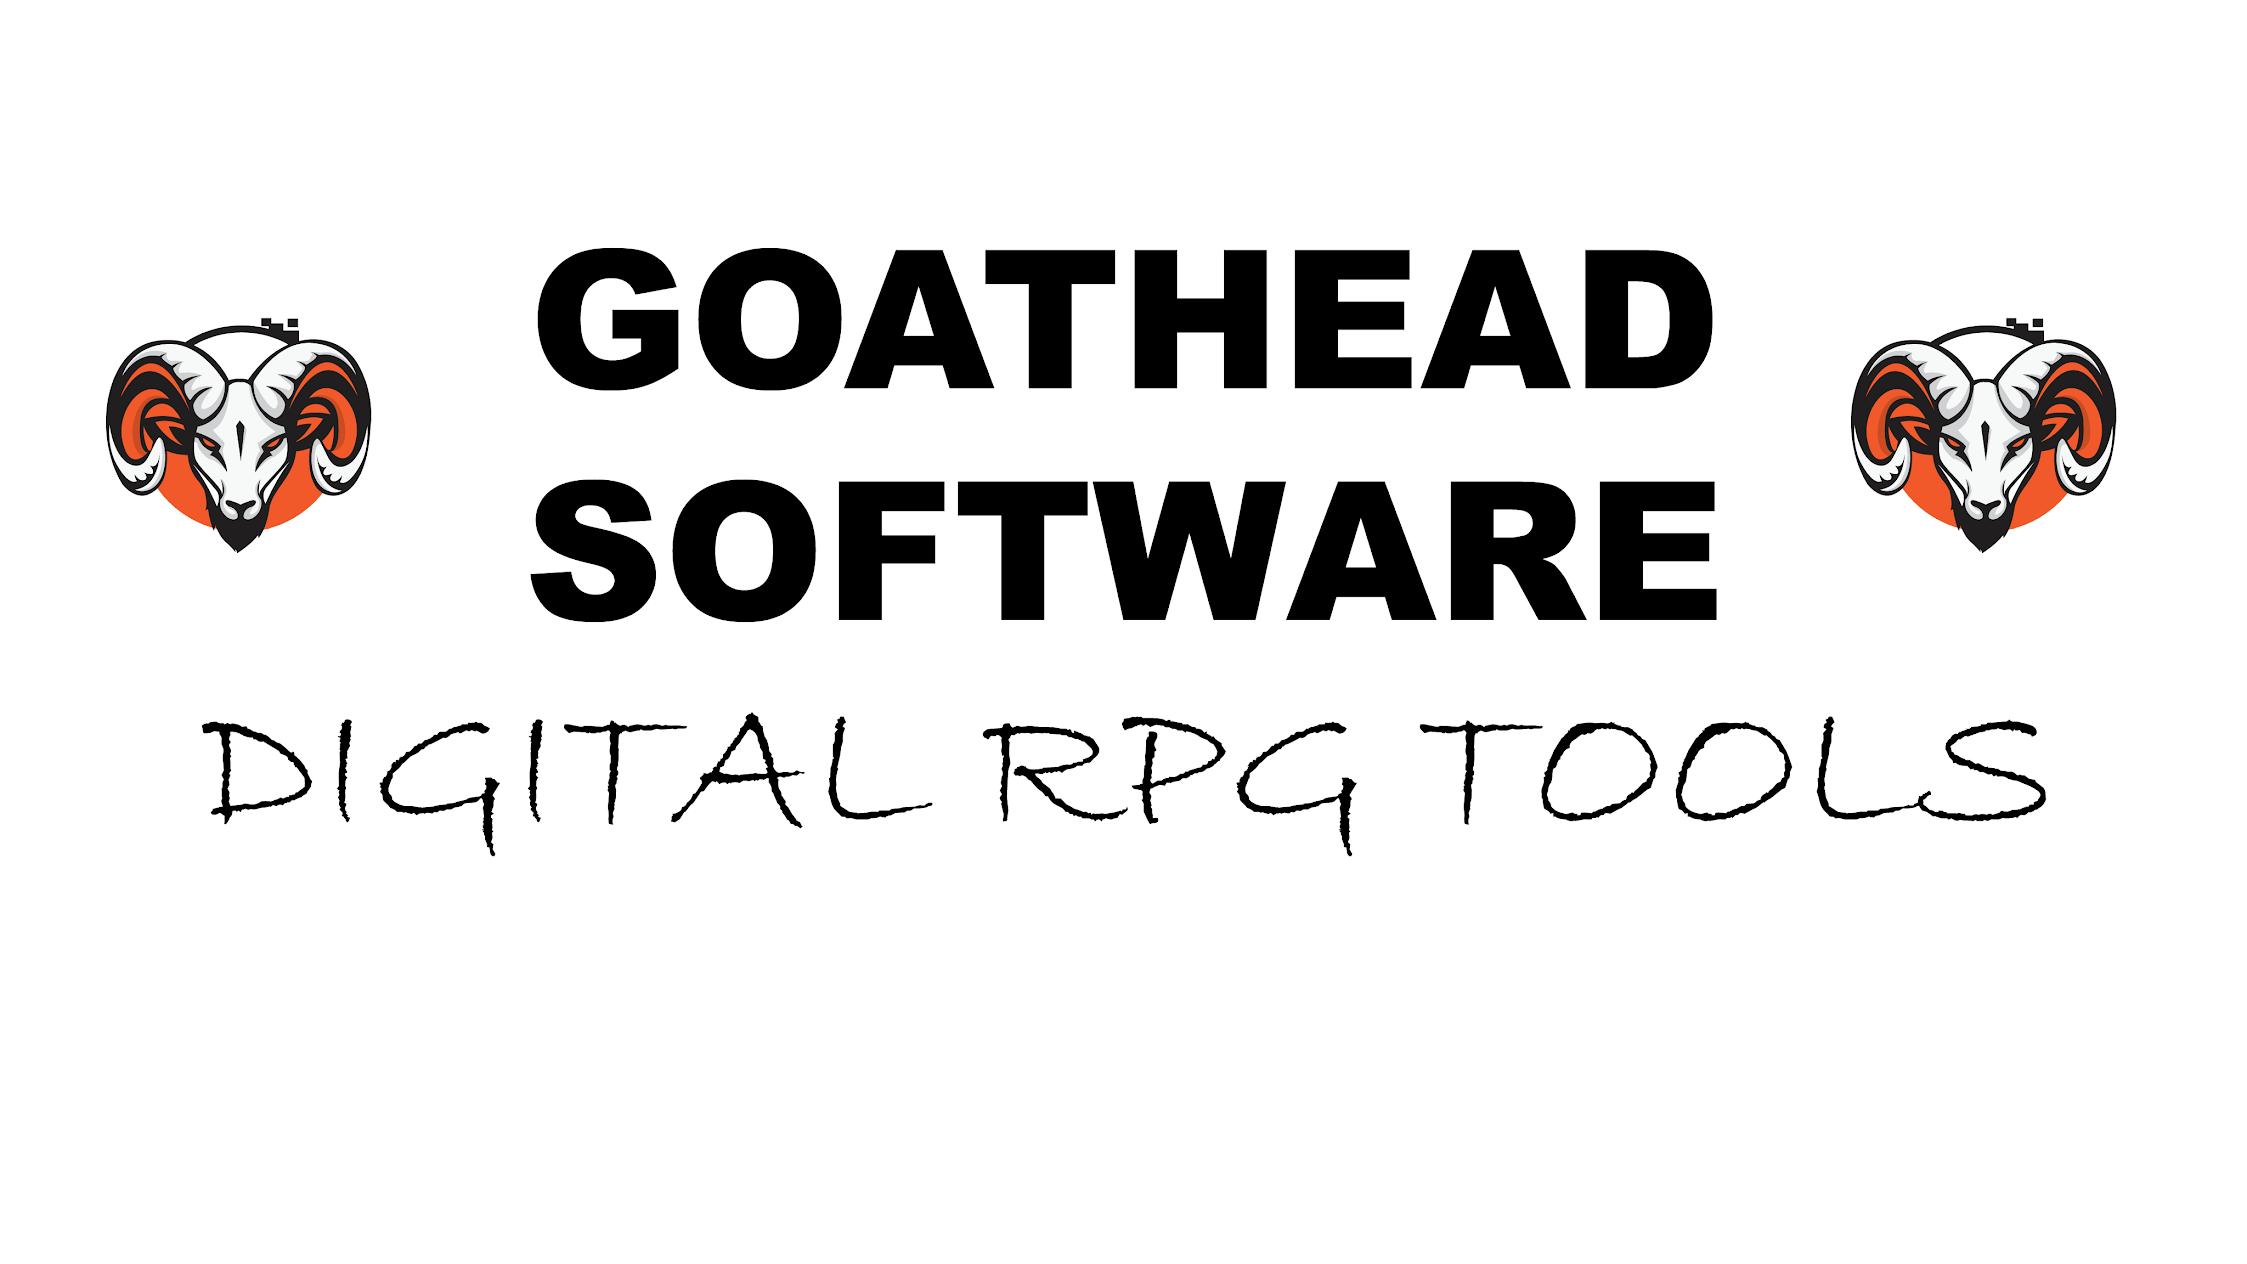 Goathead Software